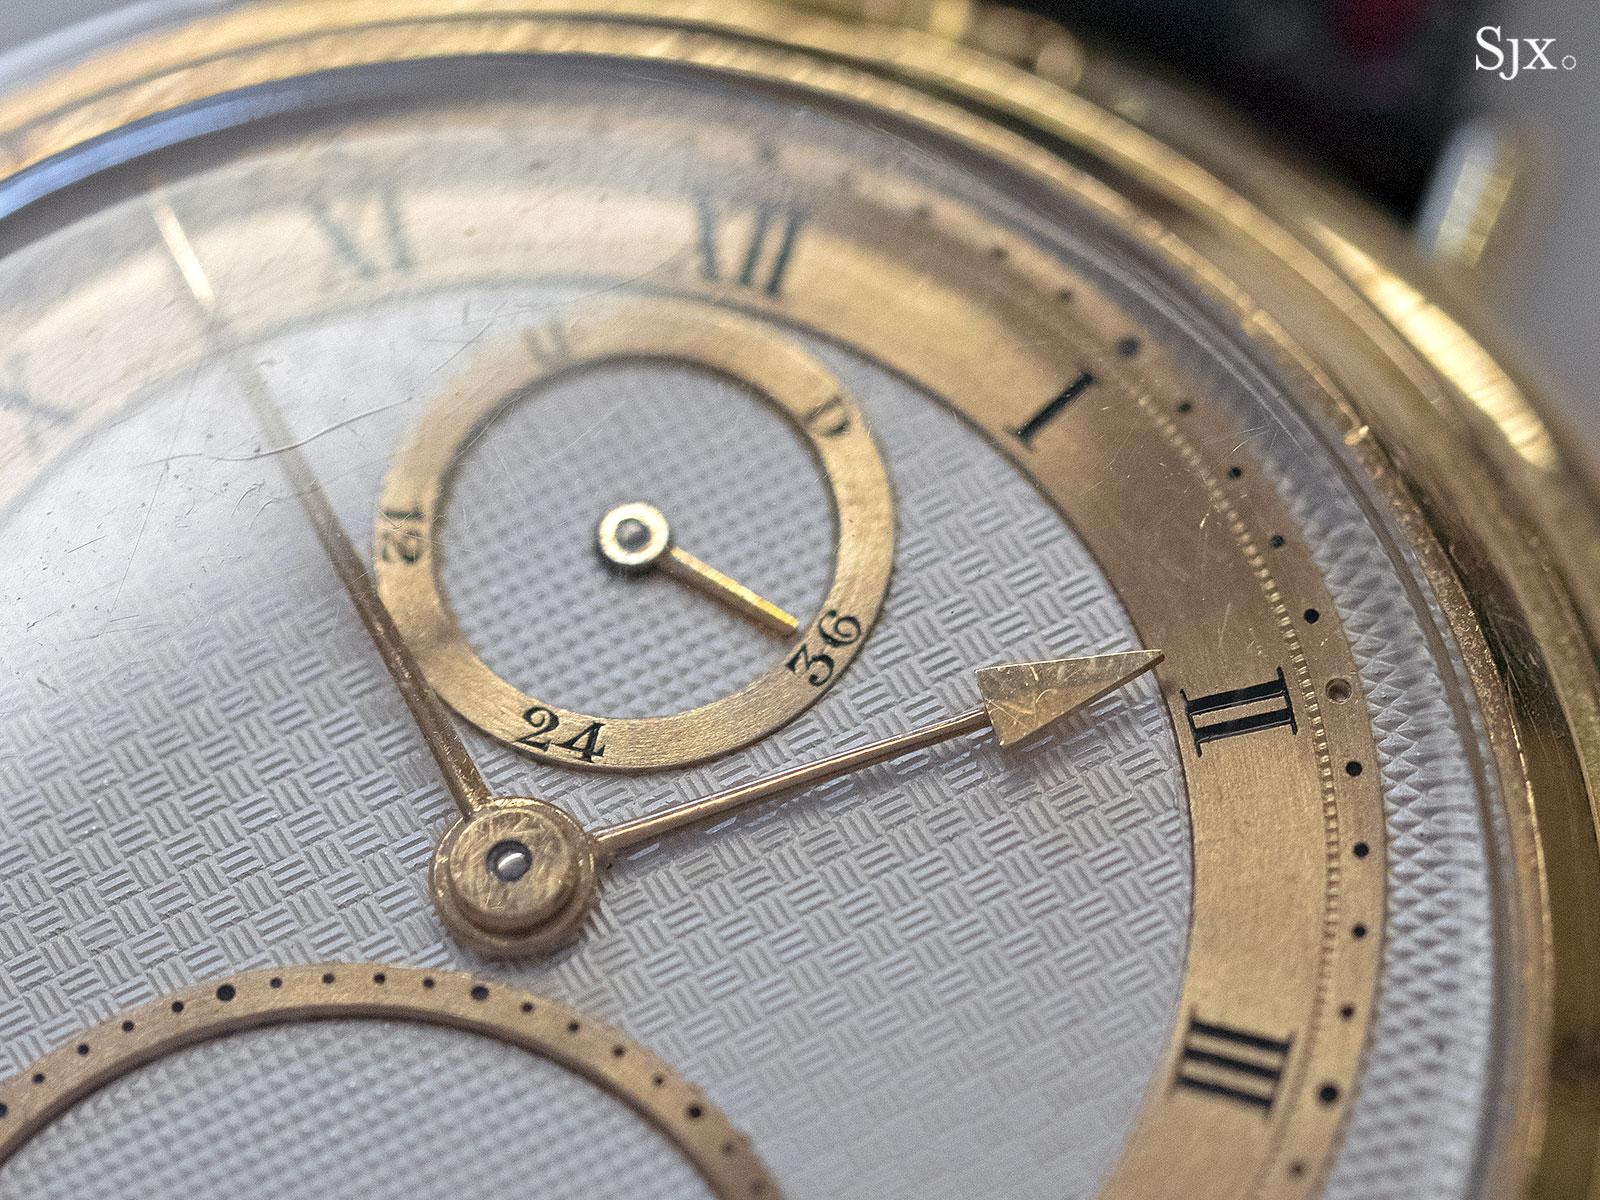 George Daniels Spring Case Tourbillon Wristwatch 3